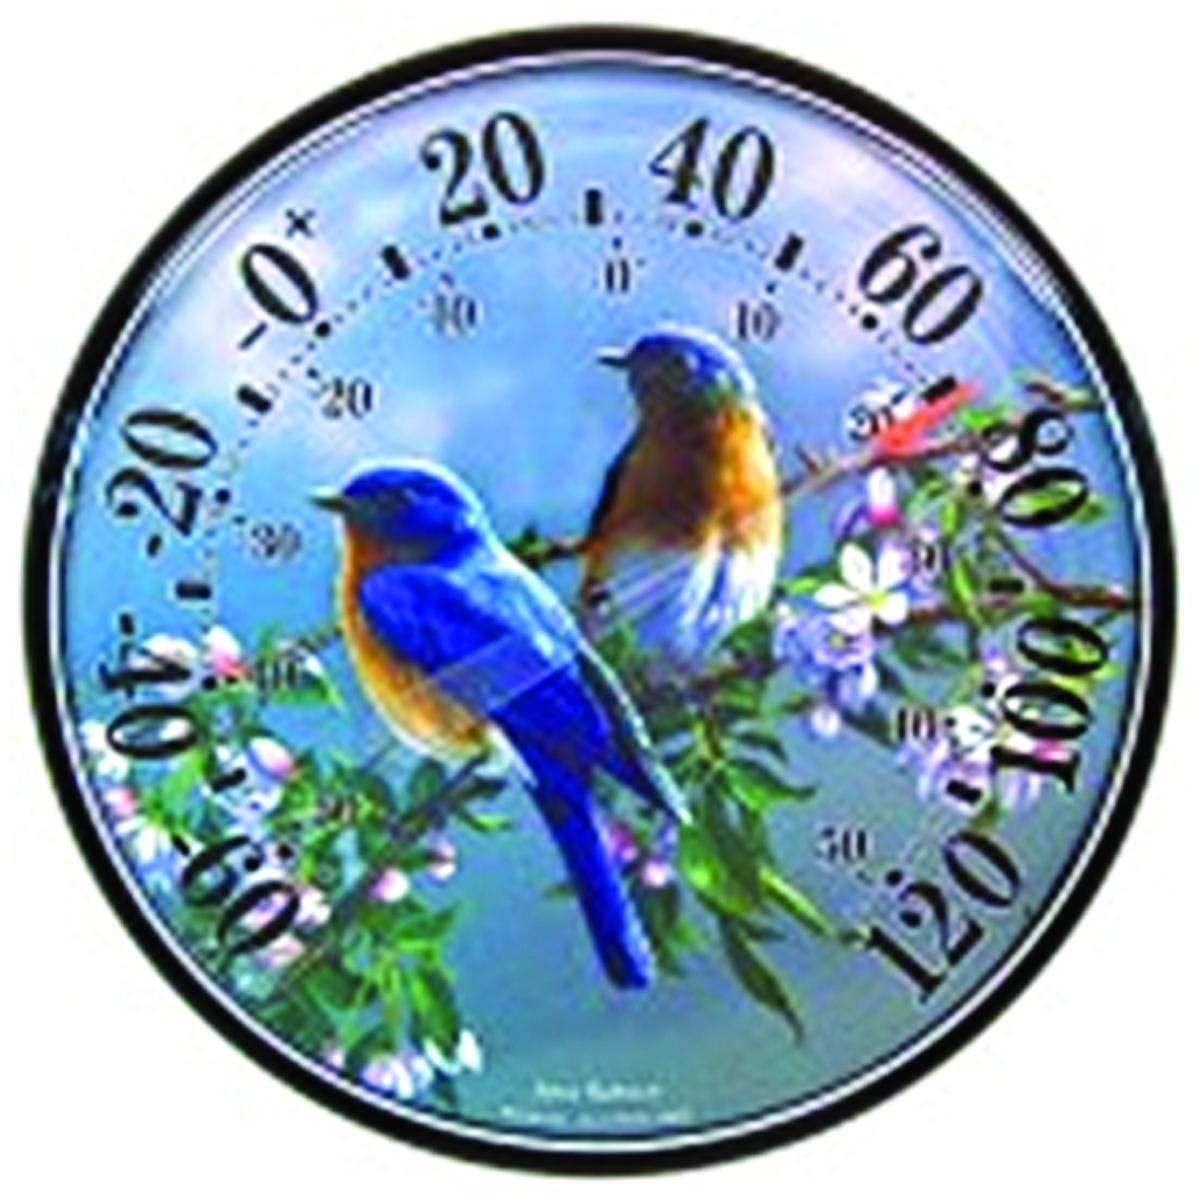 Bluebird Garden Thermometer